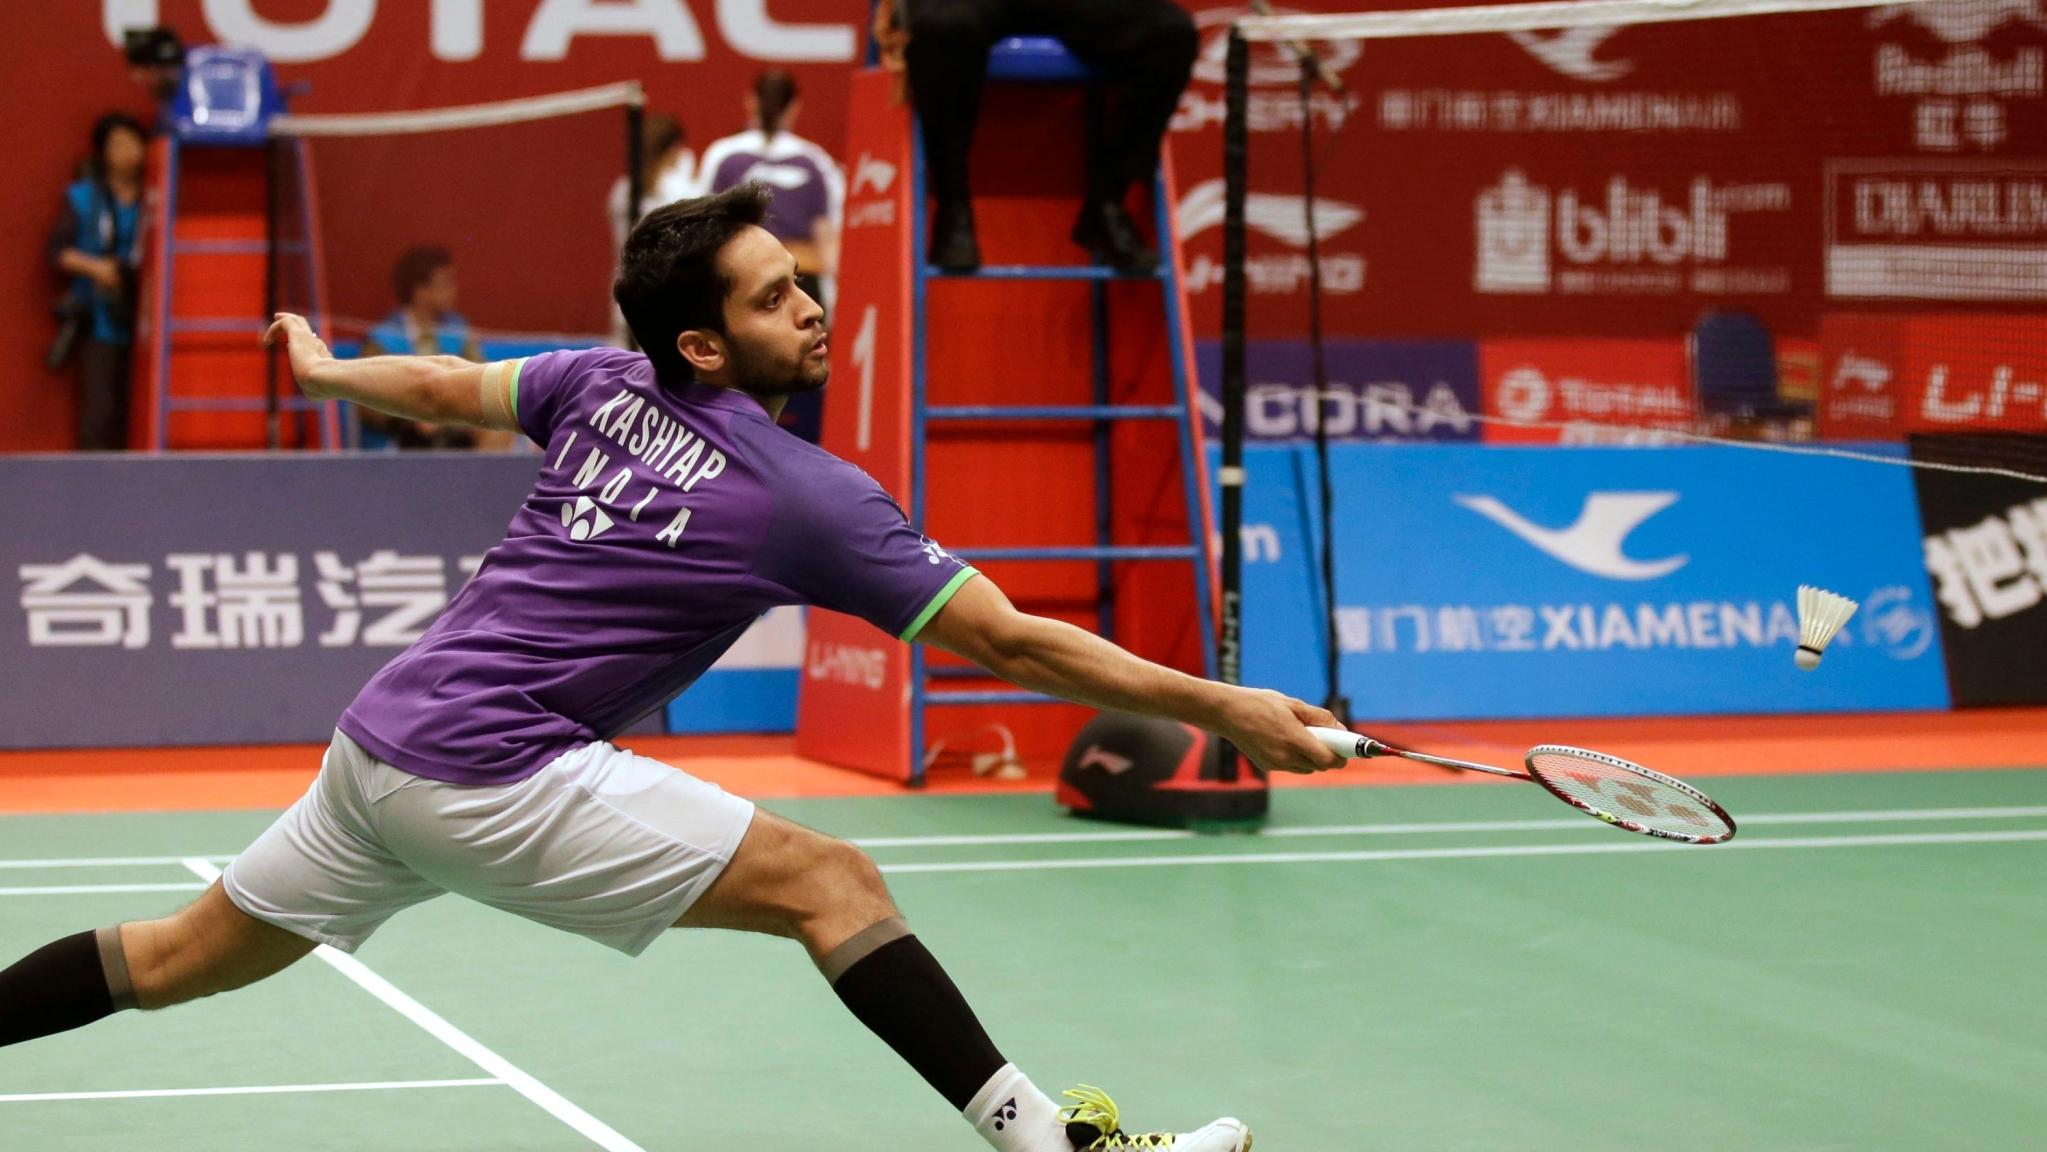 Parupalli Kashyap Exits Korea Open After S/F Loss to World No 1